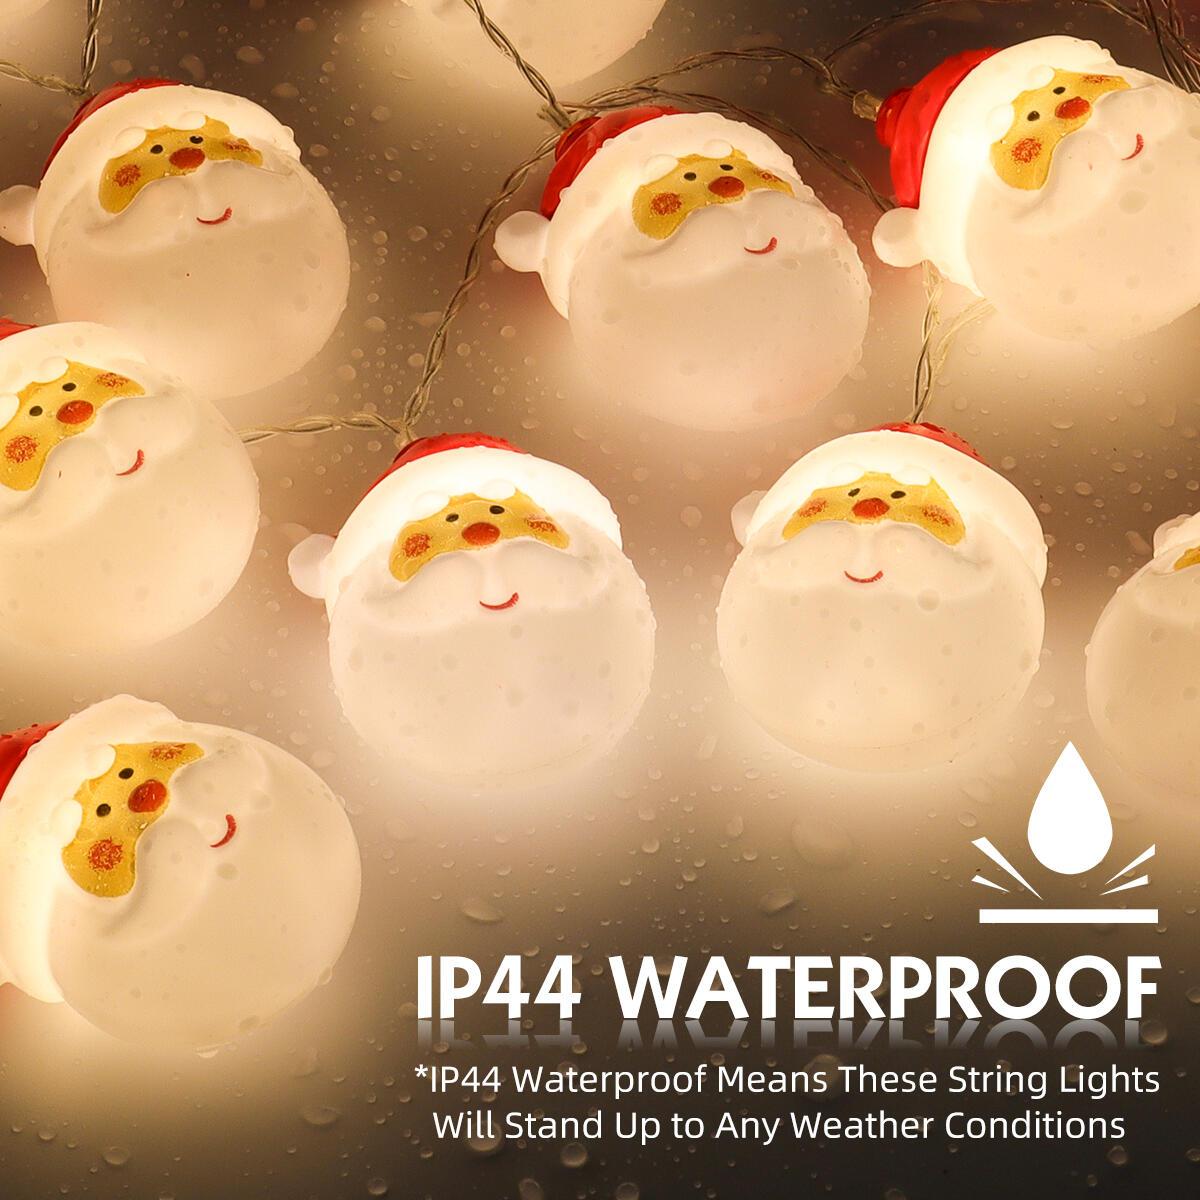 Christmas String Lights Waterproof 20 LEDs 9.84ft, LED Santa String Lights DIY Lights Decorations for Indoor Outdoor Decor Home Garden Wedding Party Xmas Tree